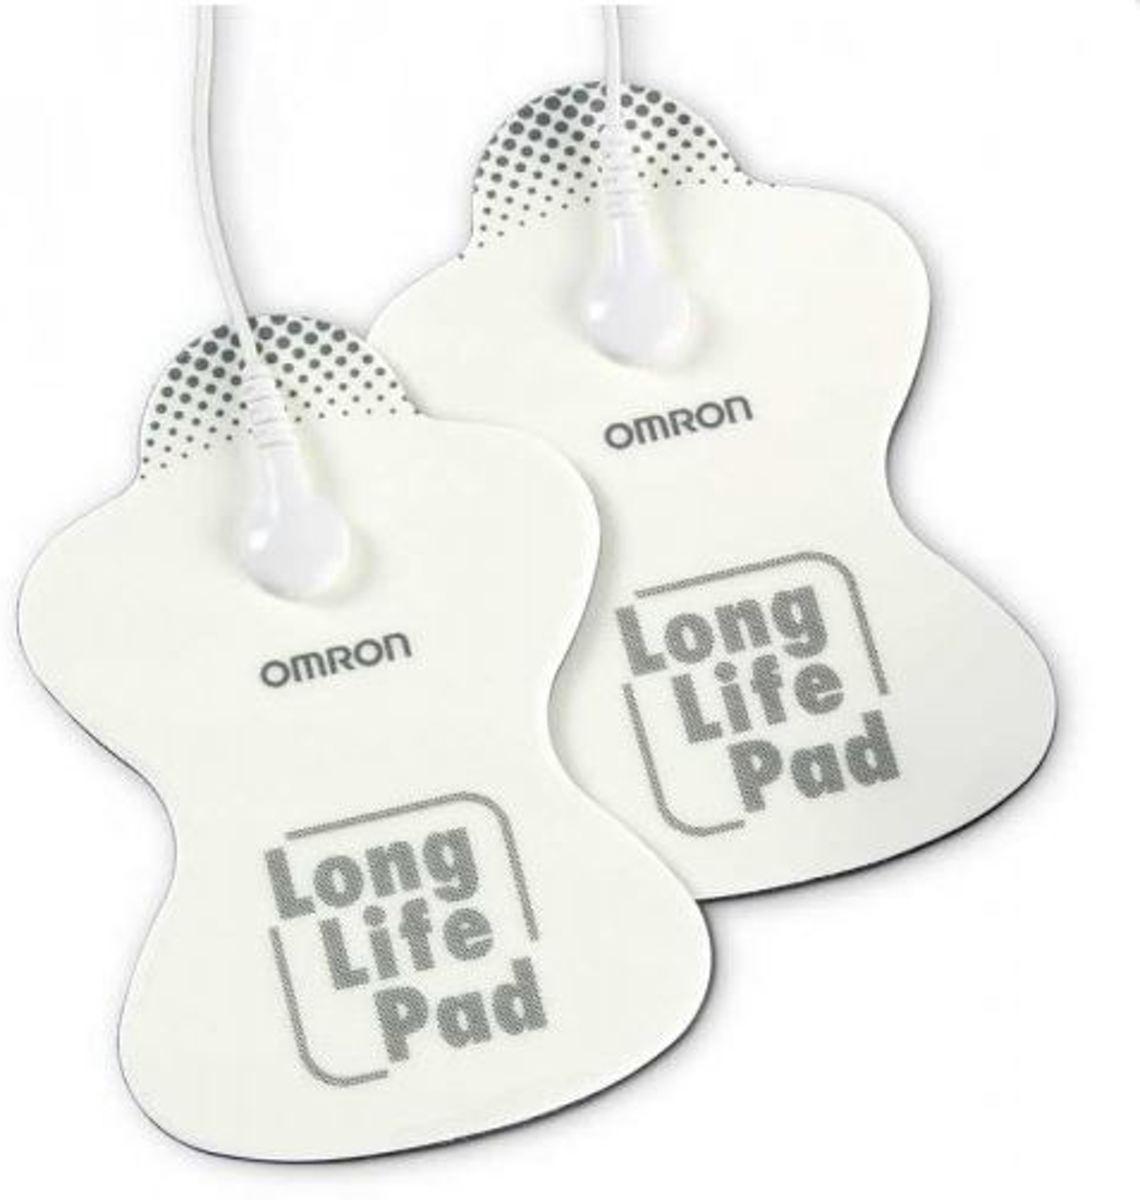 OMRON LongLife Electrode Pads E3 E4